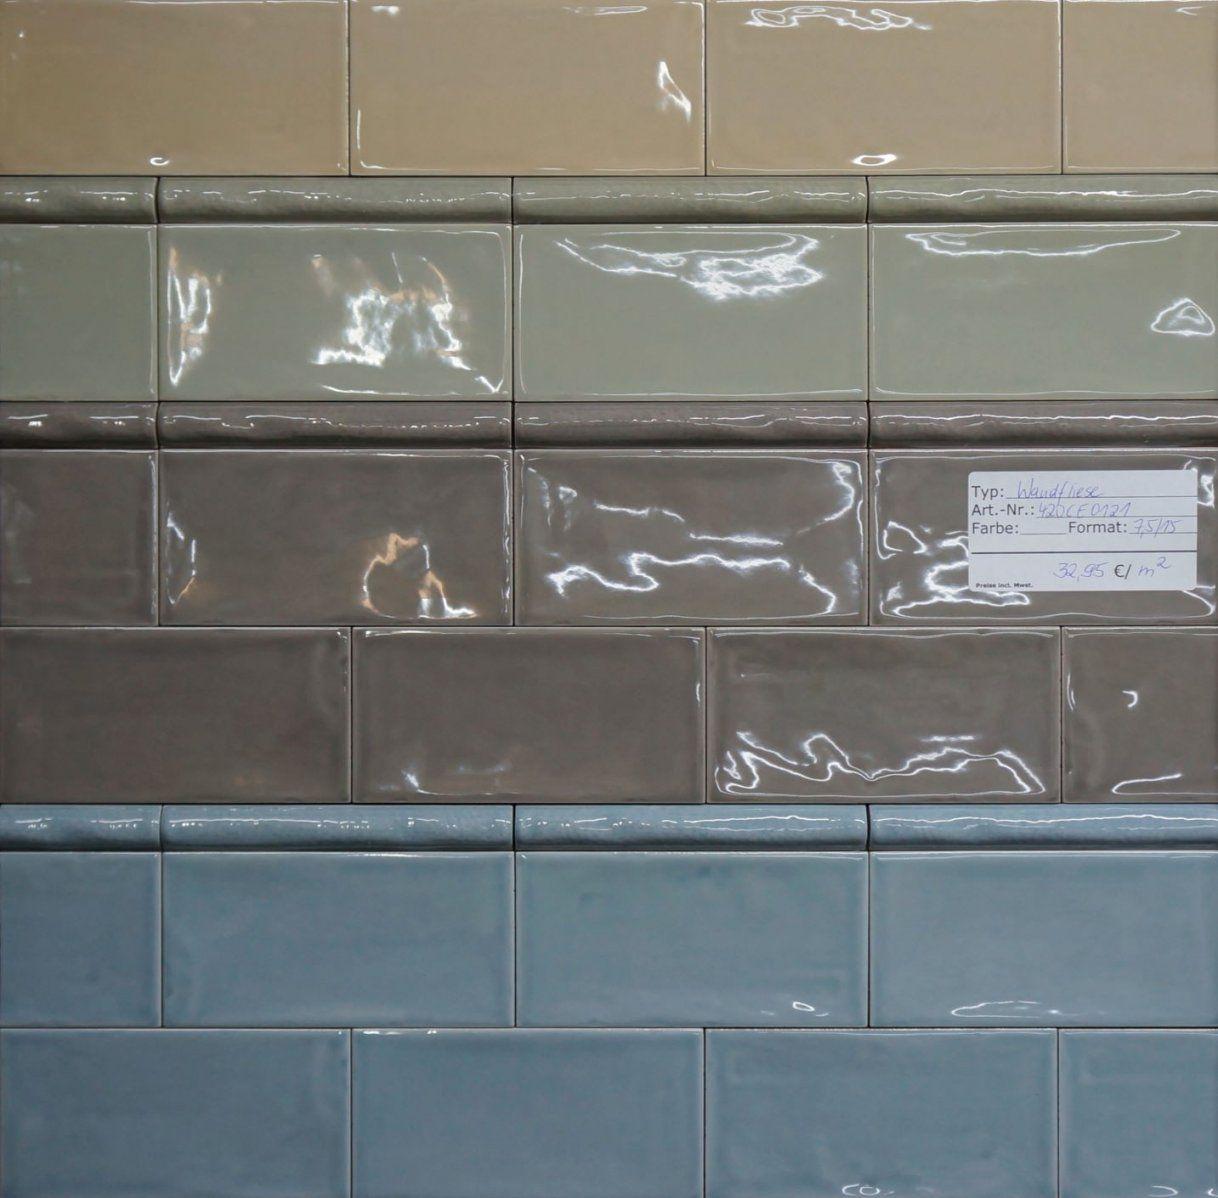 Metro Fliesen 7 5×15 Iu67 – Hitoiro von Metro Fliesen 7 5X15 Photo